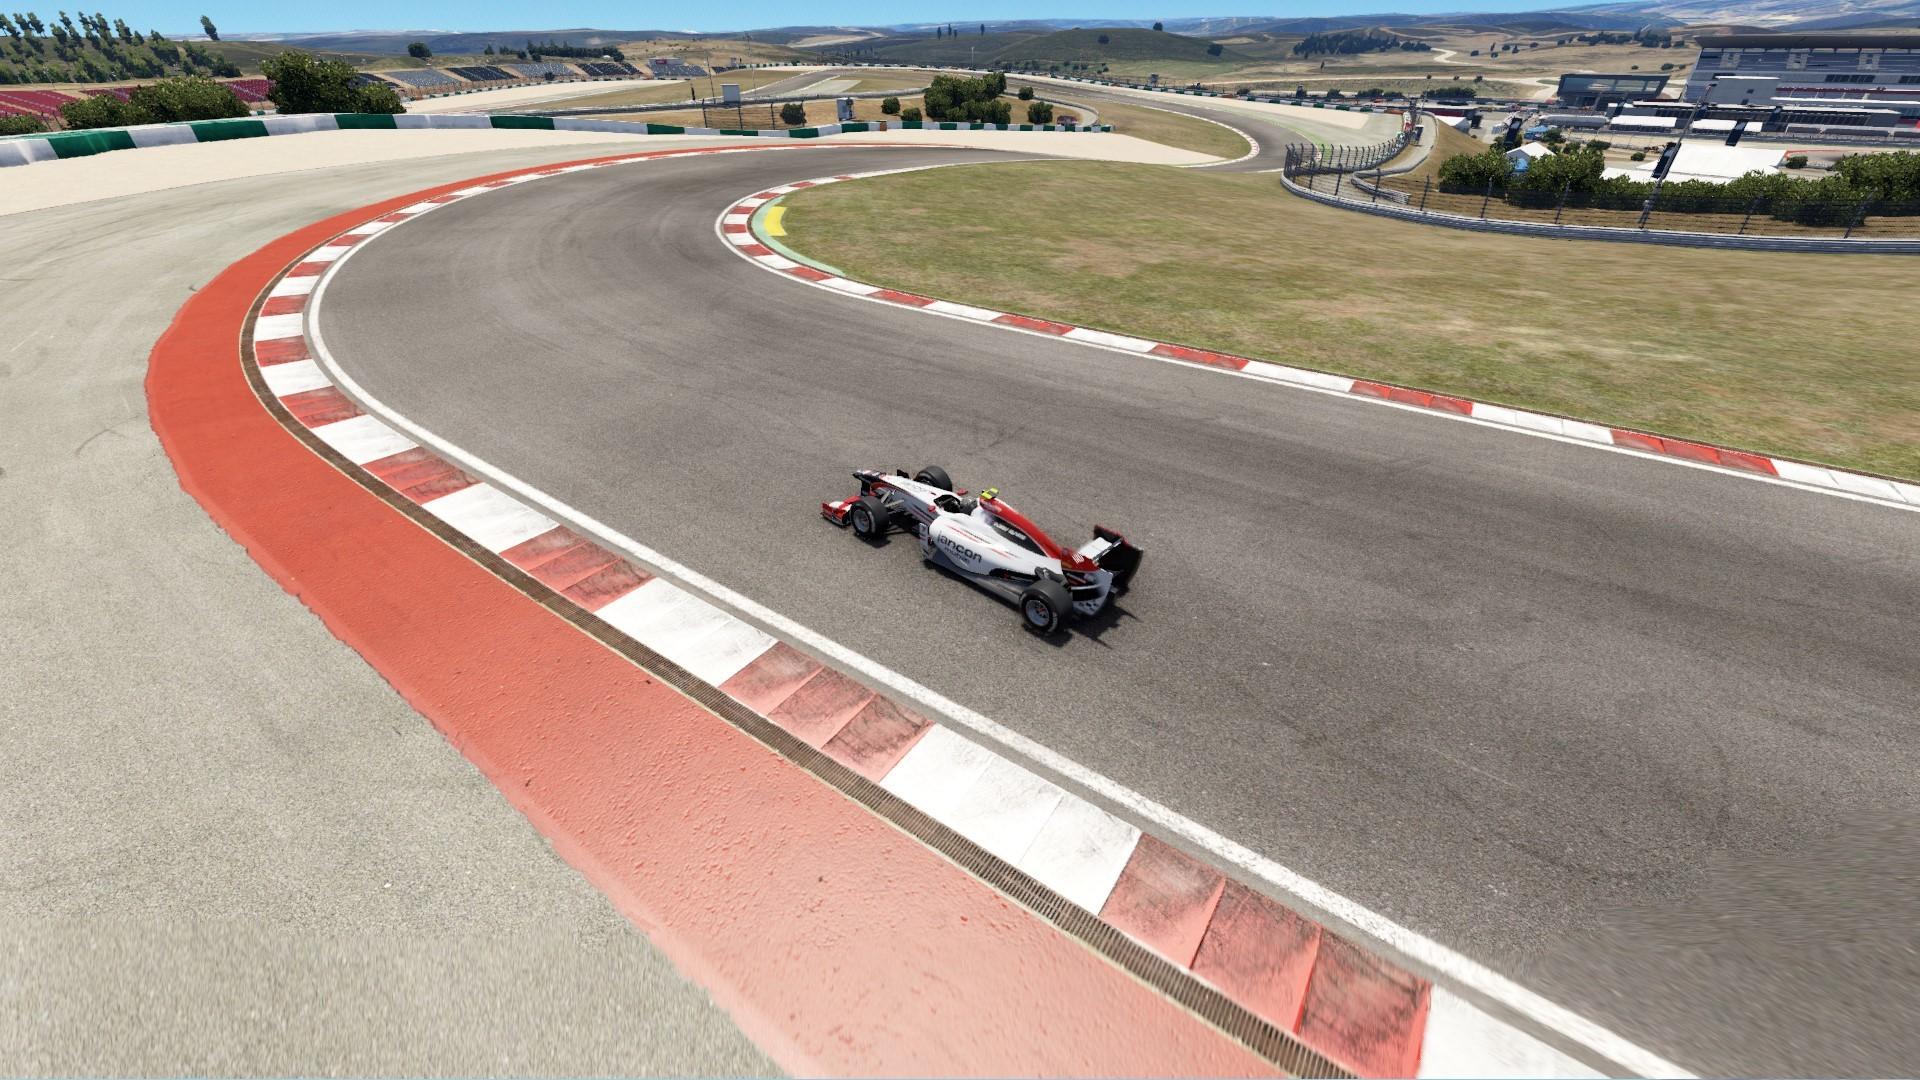 car entering turn 11